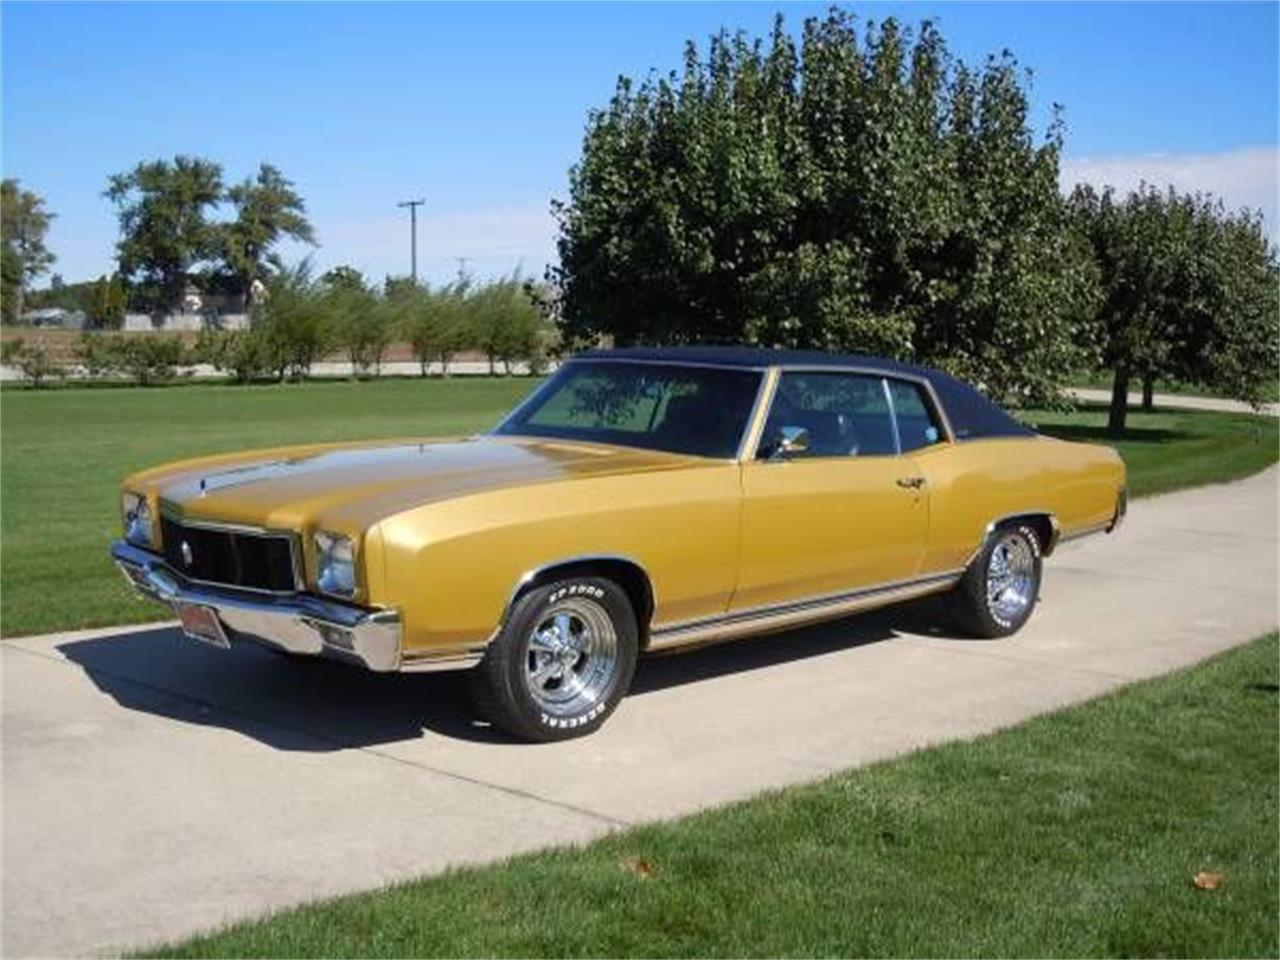 1971 Chevrolet Monte Carlo For Sale In Cadillac Mi Classiccarsbay Com